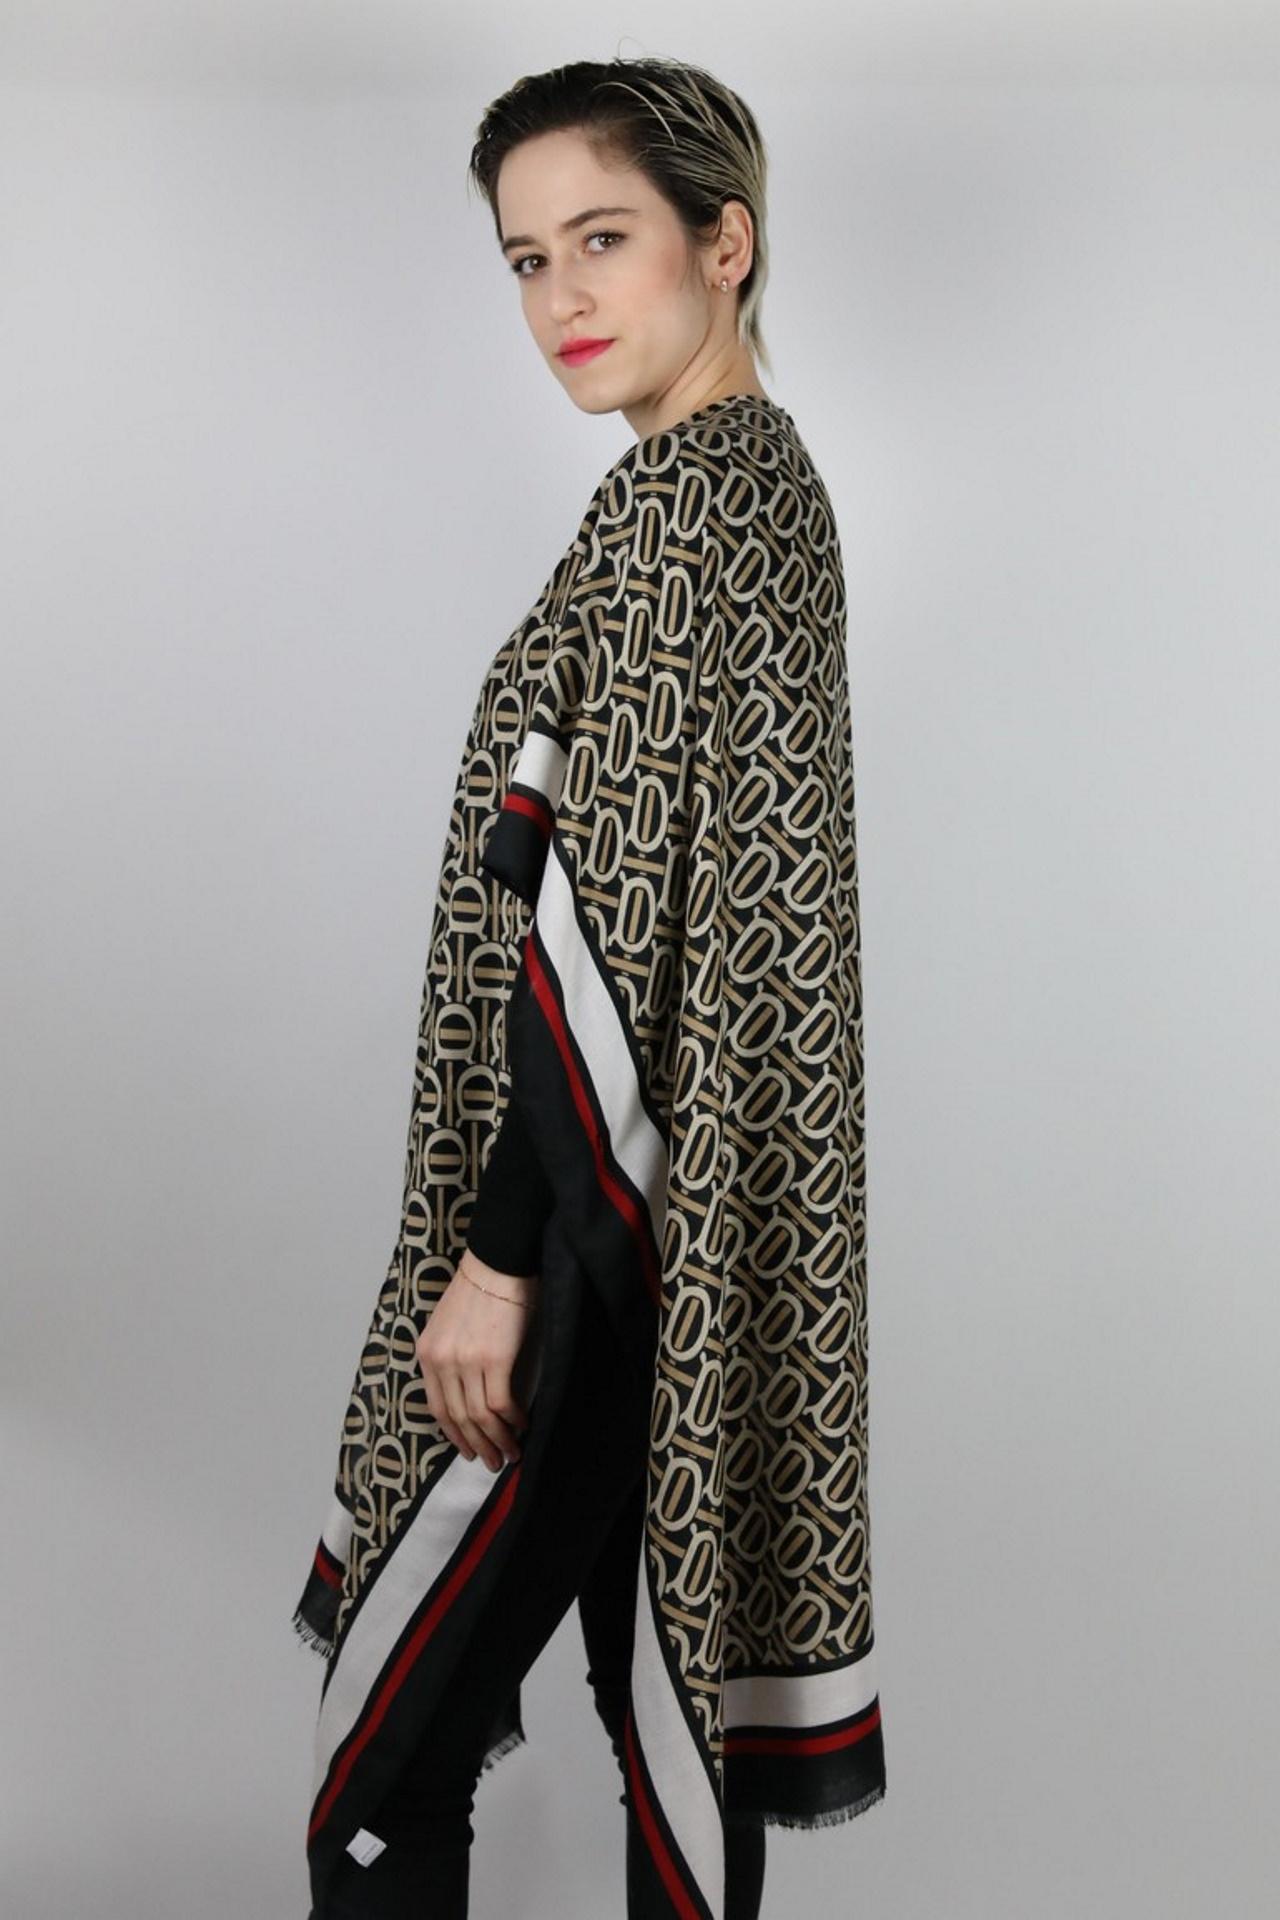 CLOTHES16 STOLA DONNA FOULARD CARDIGAN COPRISPALLE 2 1stAmerican elegante stola da donna foulard cardigan coprispalle